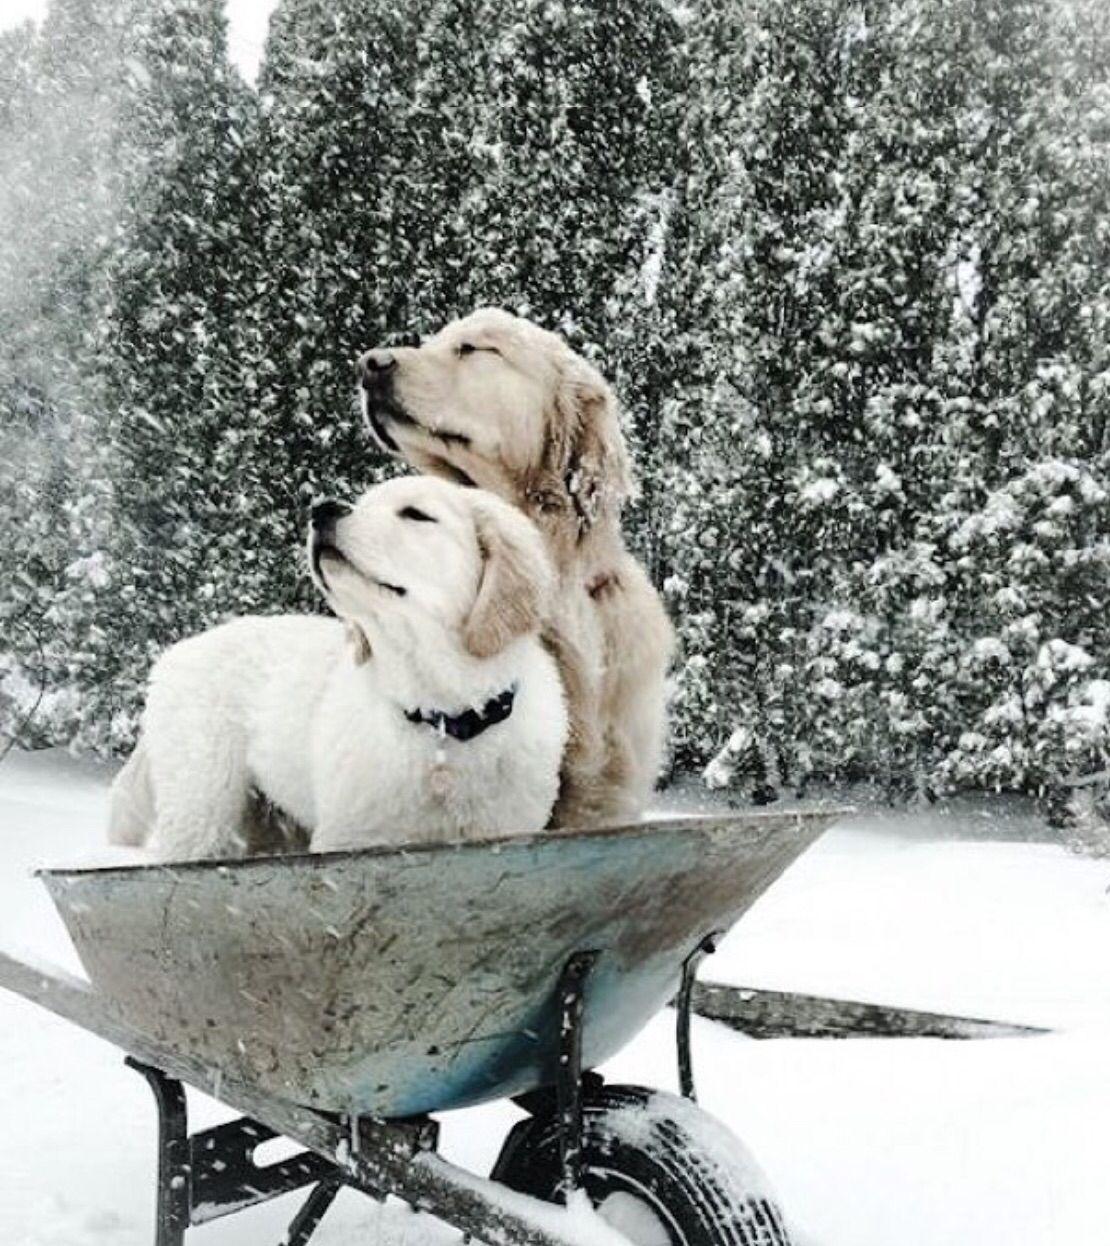 Dogs in wheelbarrow in the snow. Precious Pets, Cute